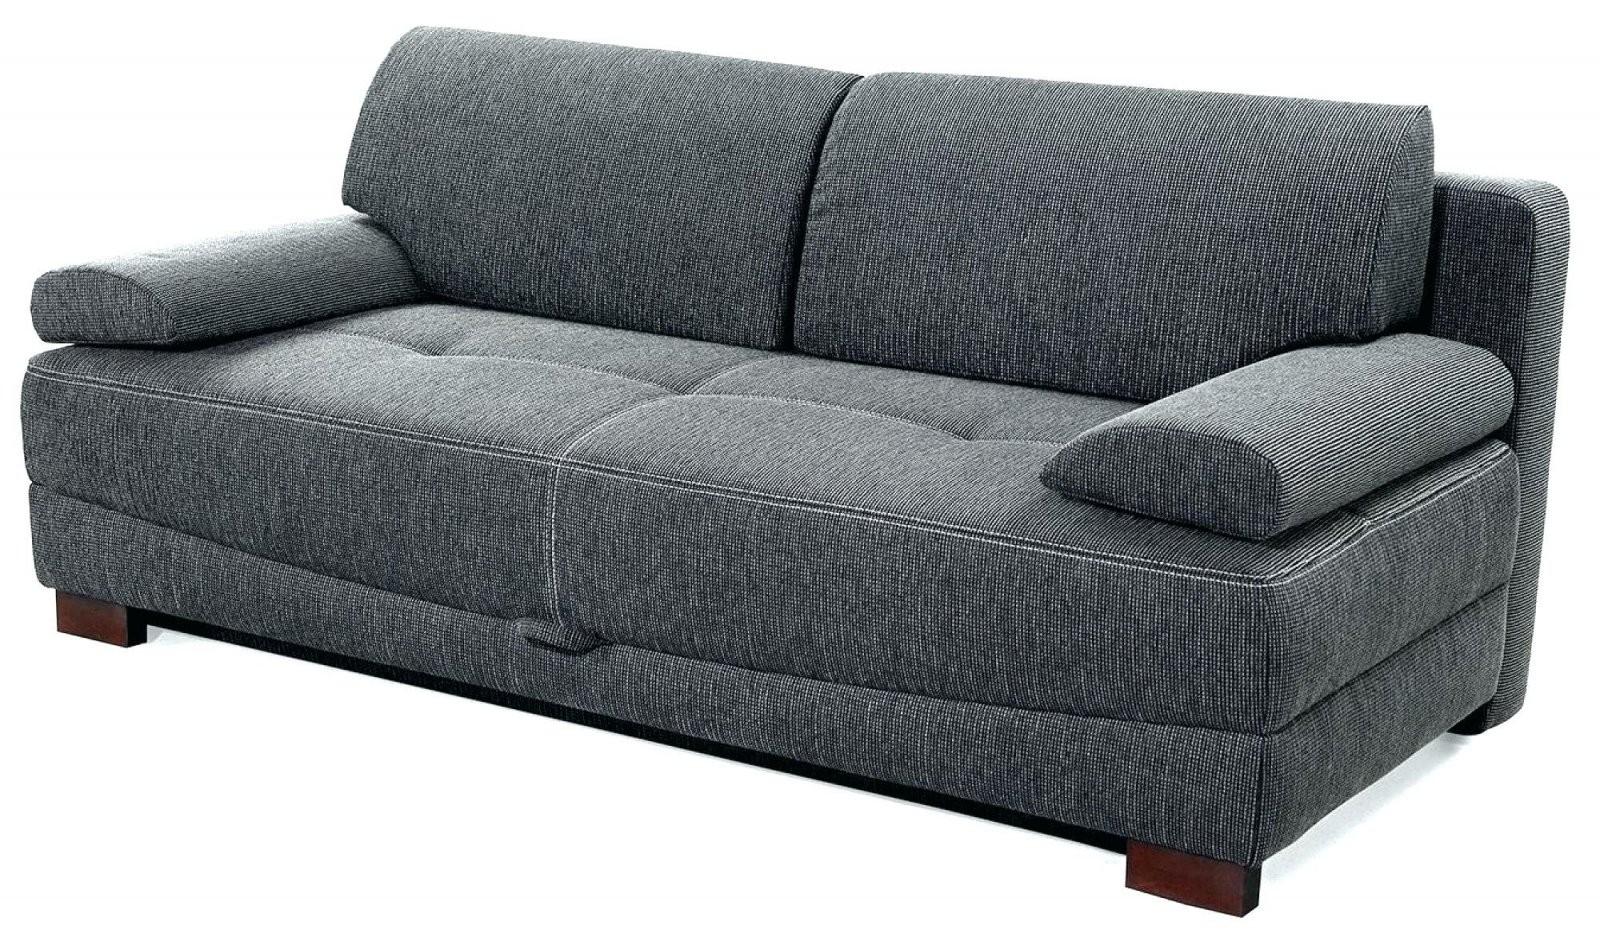 Poco Big Sofa E6D5 10 Poco Big Sofa Inspirierend Lqaff – Steve Mason von Big Sofa Xxl Poco Bild